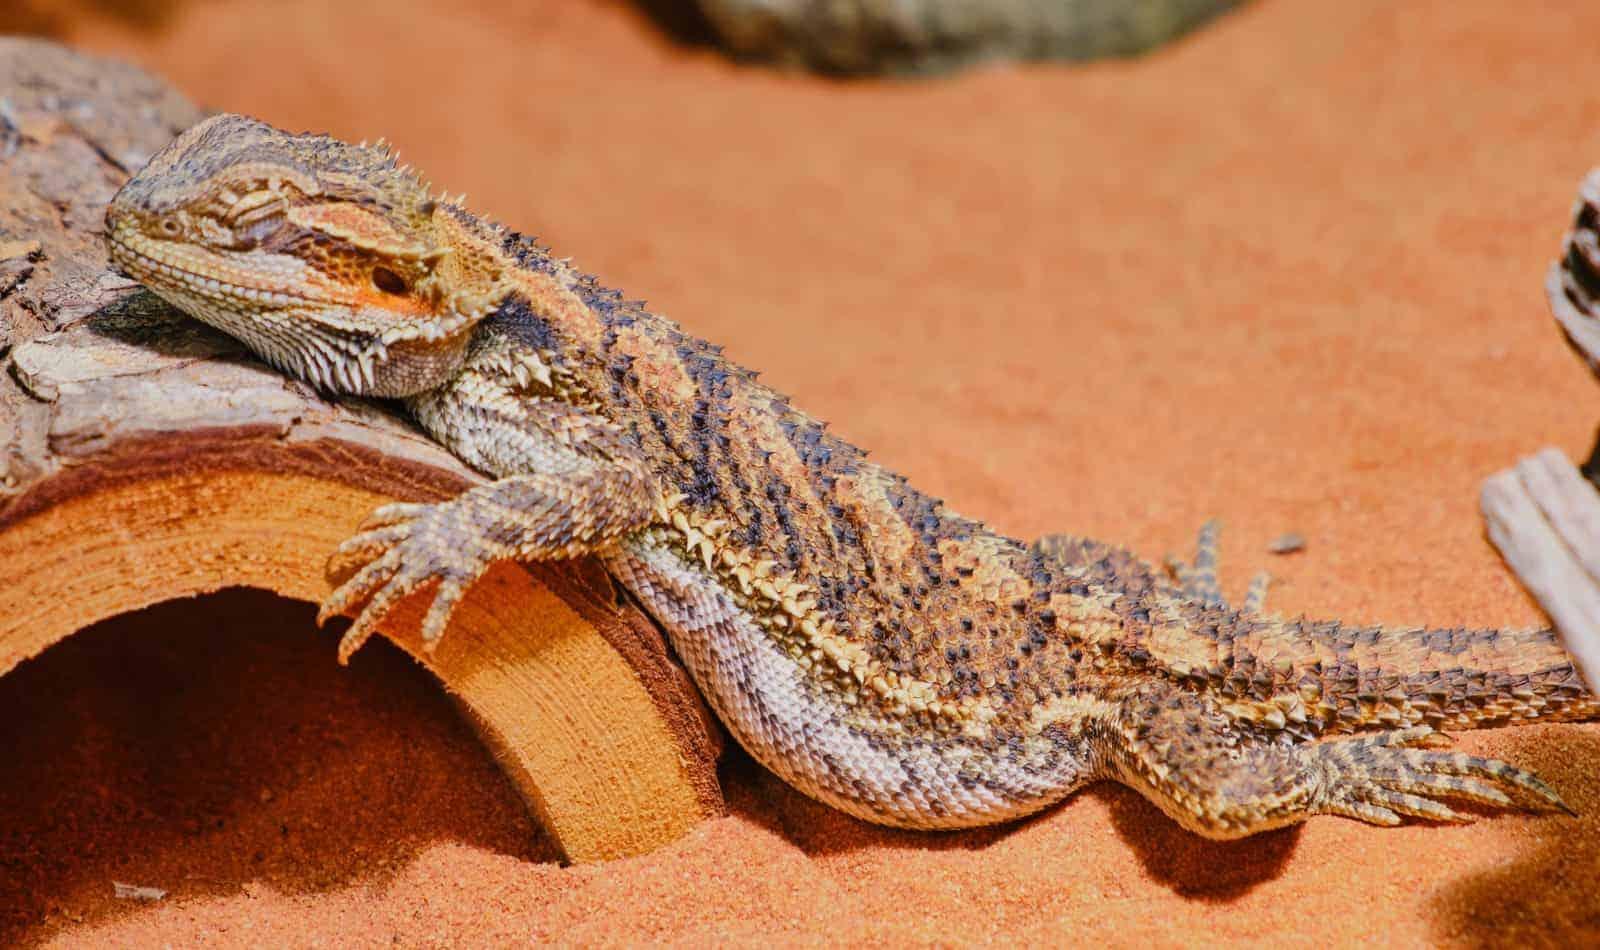 female bearded dragon sleeping in the corner lying on a wood